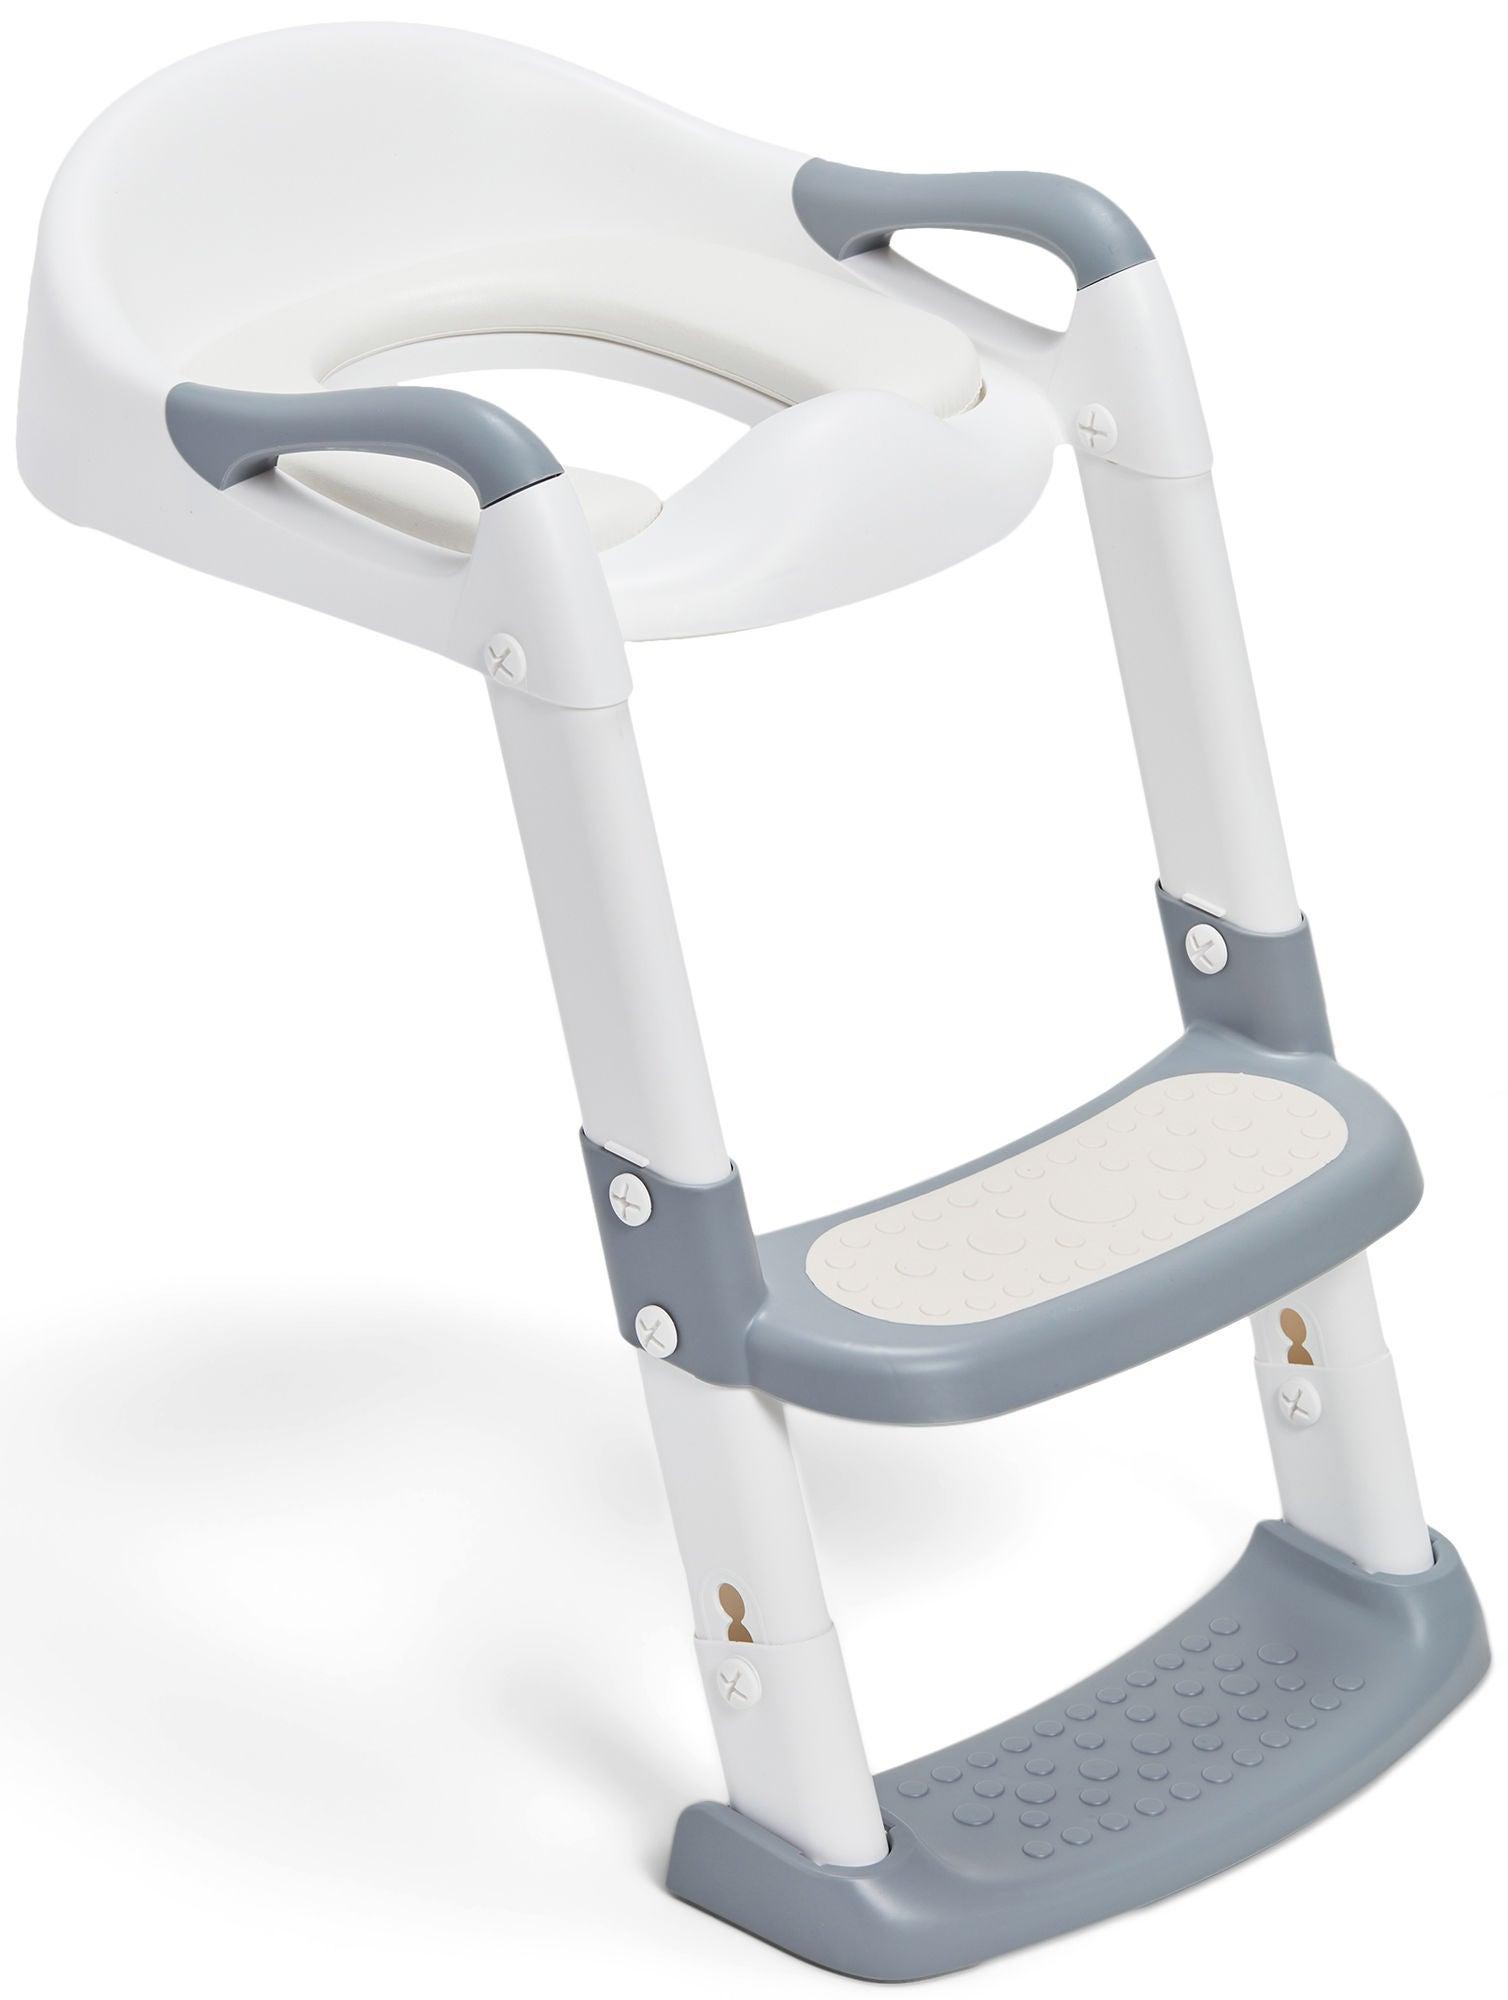 Beemoo Care WC-supistaja, Grey/White